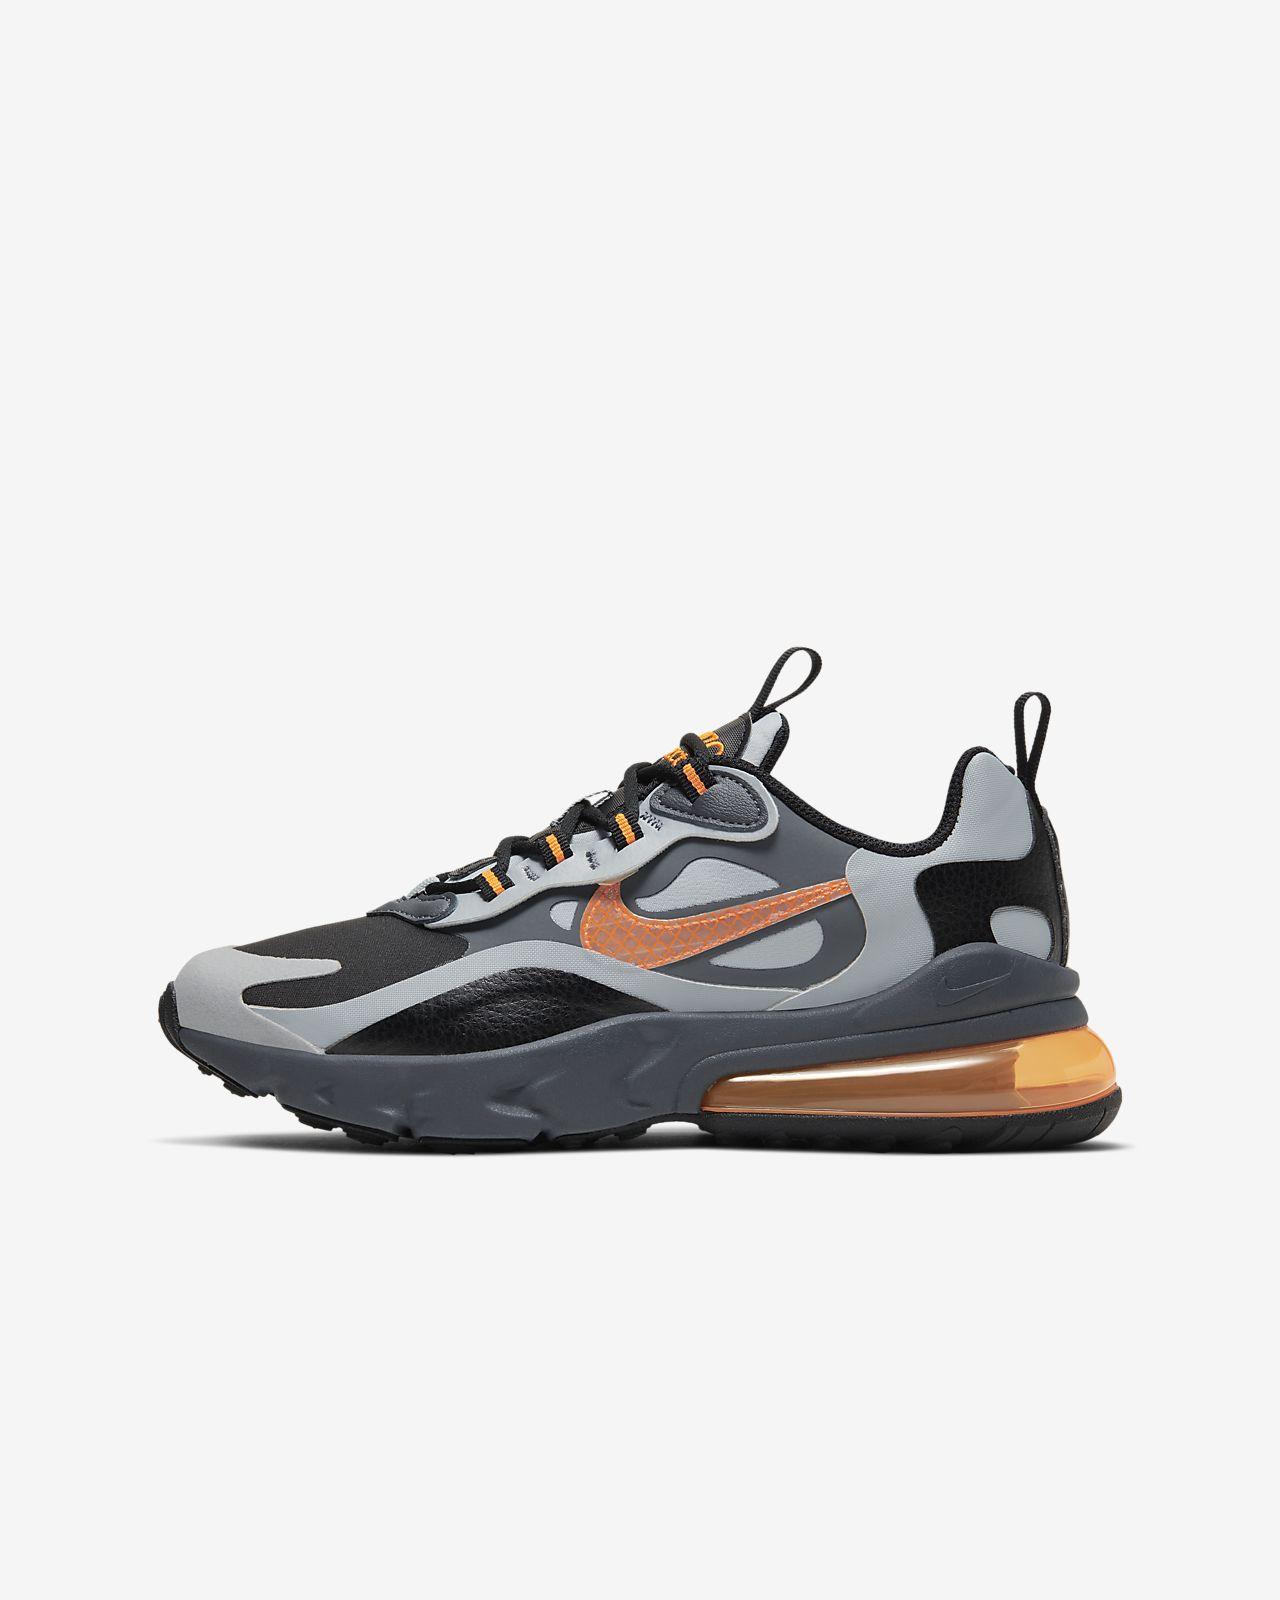 Nike Air Max 270 React Winter Schuh für ältere Kinder